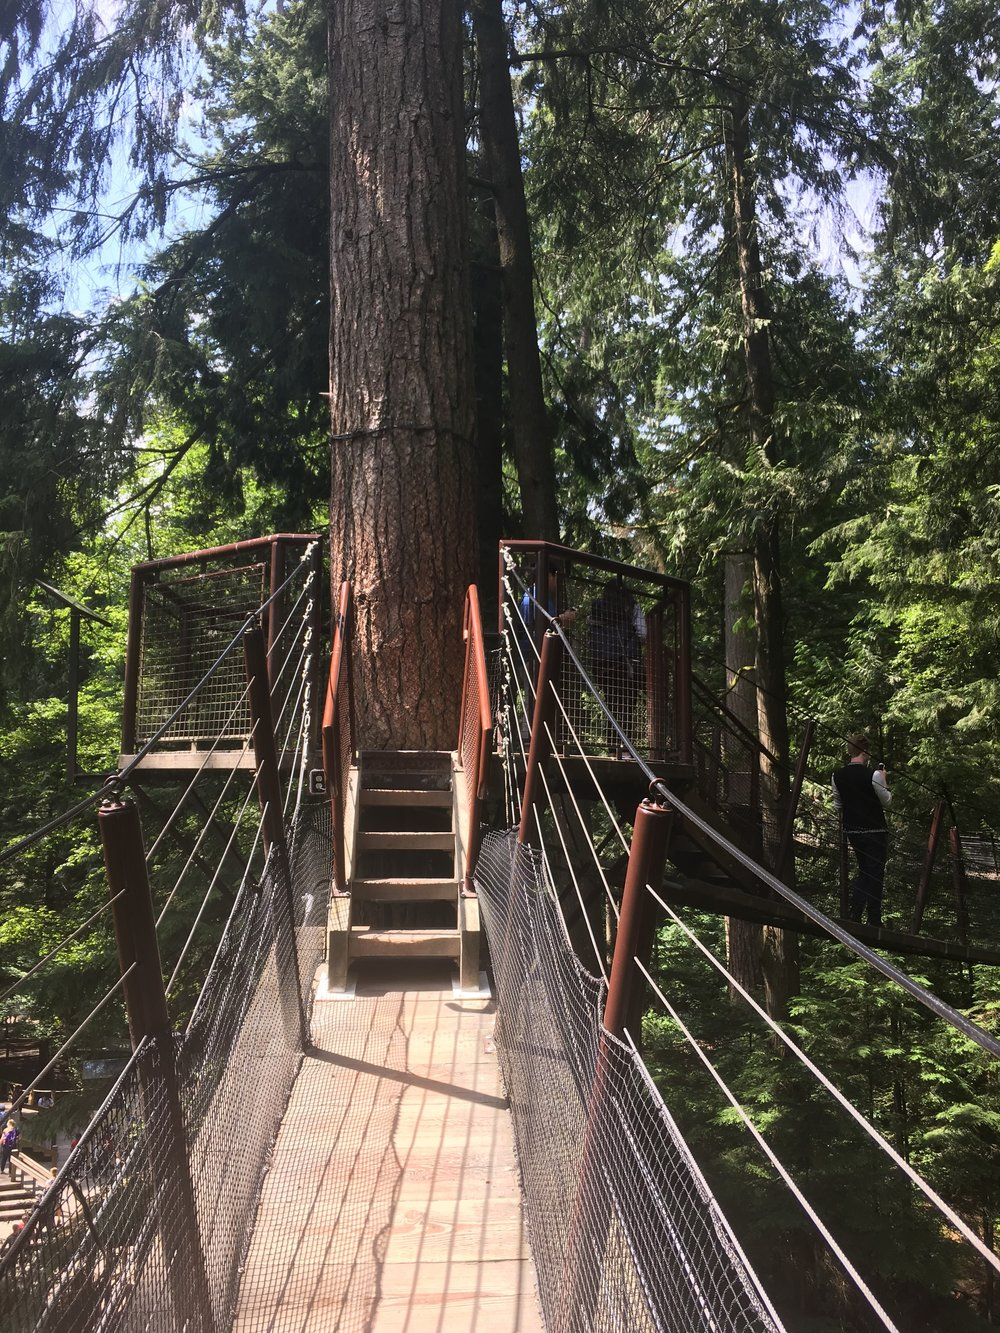 Trails at Capilano Park